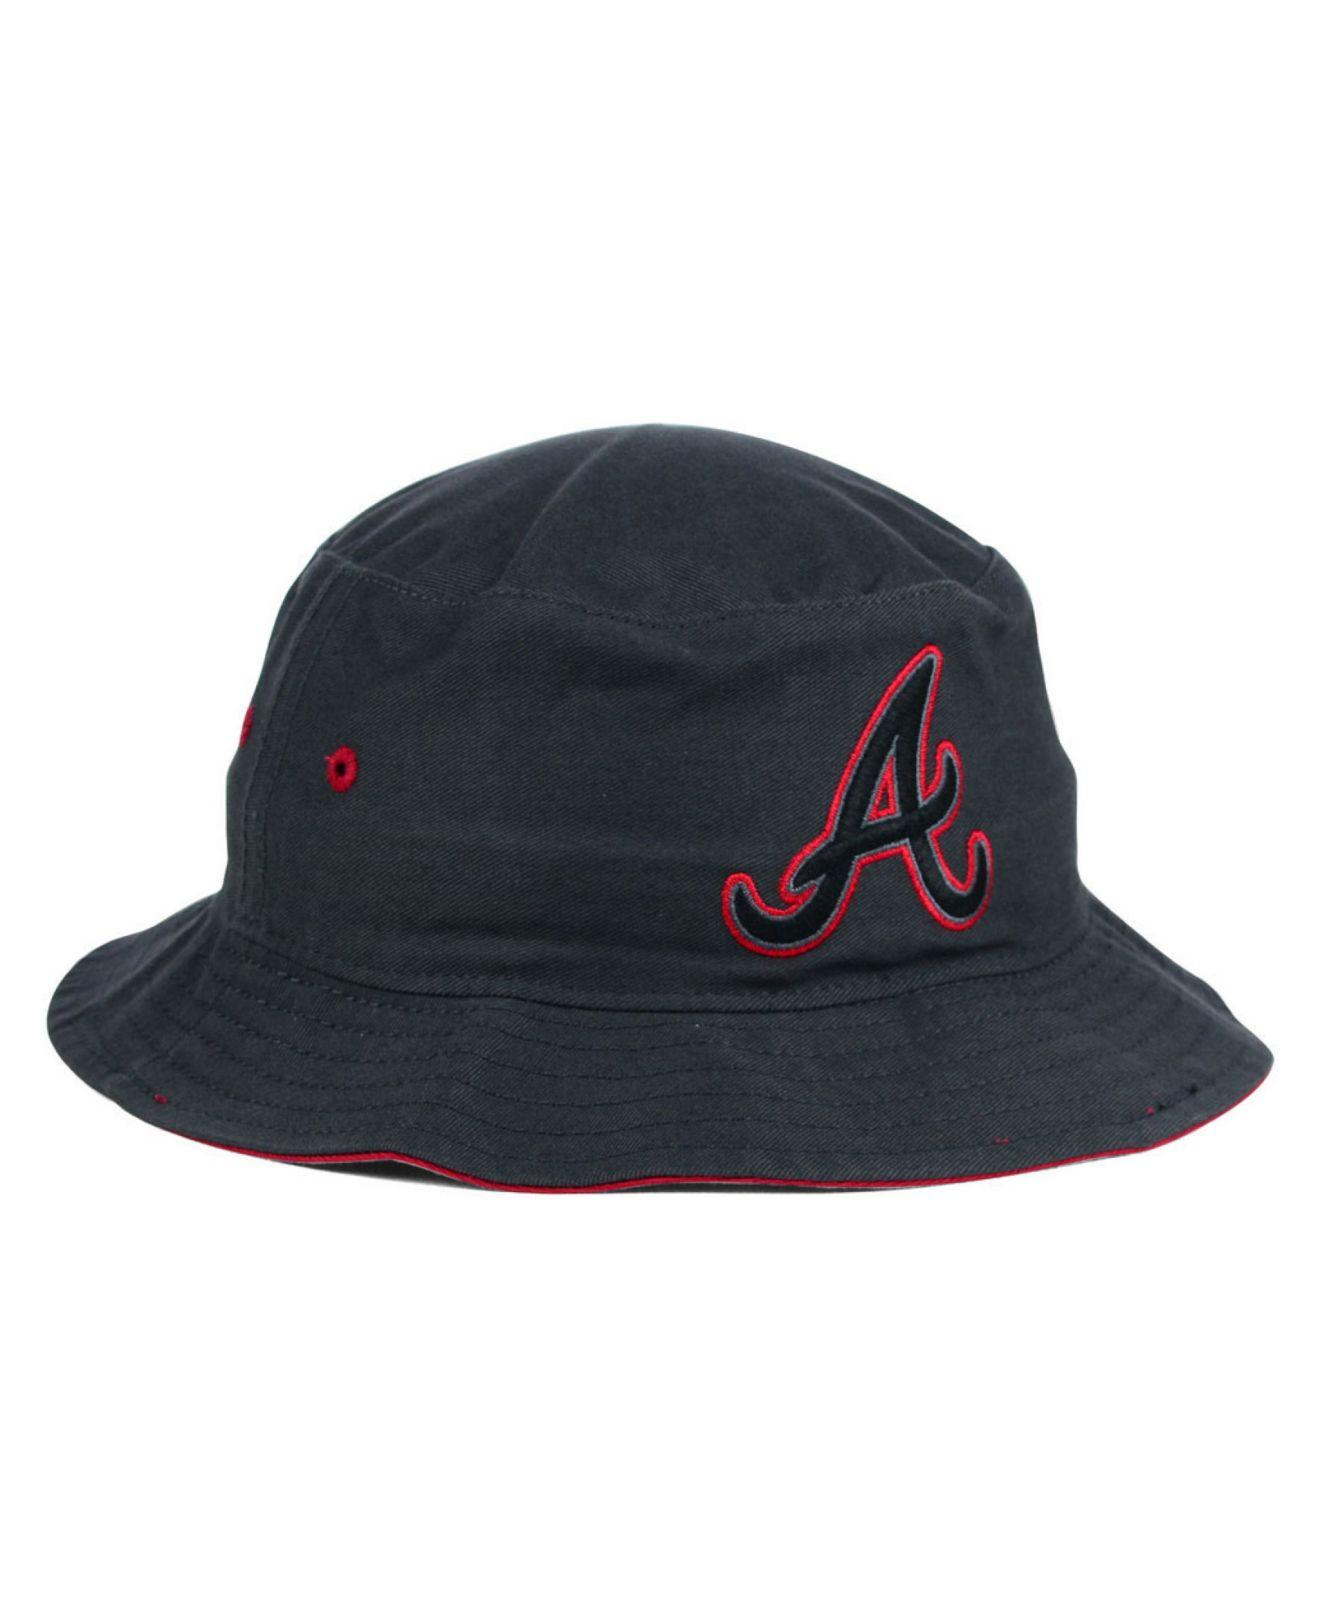 b133c31e0b4 Lyst - 47 Brand Atlanta Braves Turbo Bucket Hat in Gray